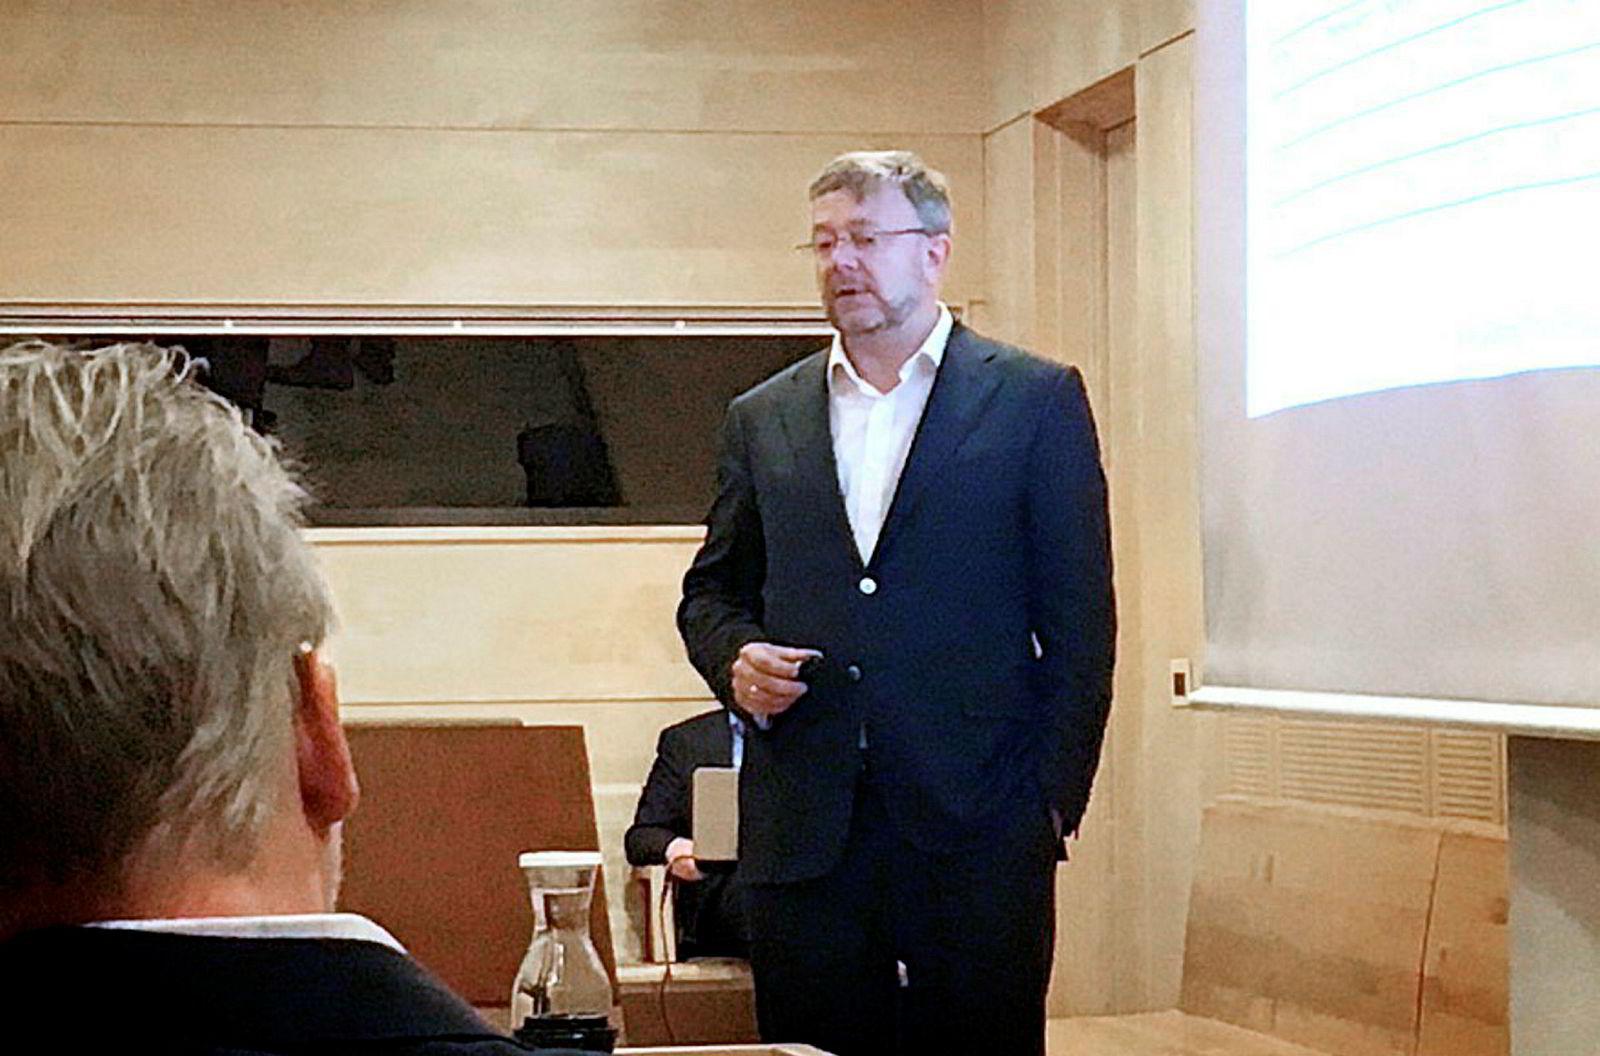 Tidligere direktør og forvalter i Alfred Berg forvaltning, nå forvalter i DNB, Ole Jakob Wold mener forvaltningen av fondet DNB Norge var suveren. I rettssaken mellom Forbrukerrådet og DNB. ---